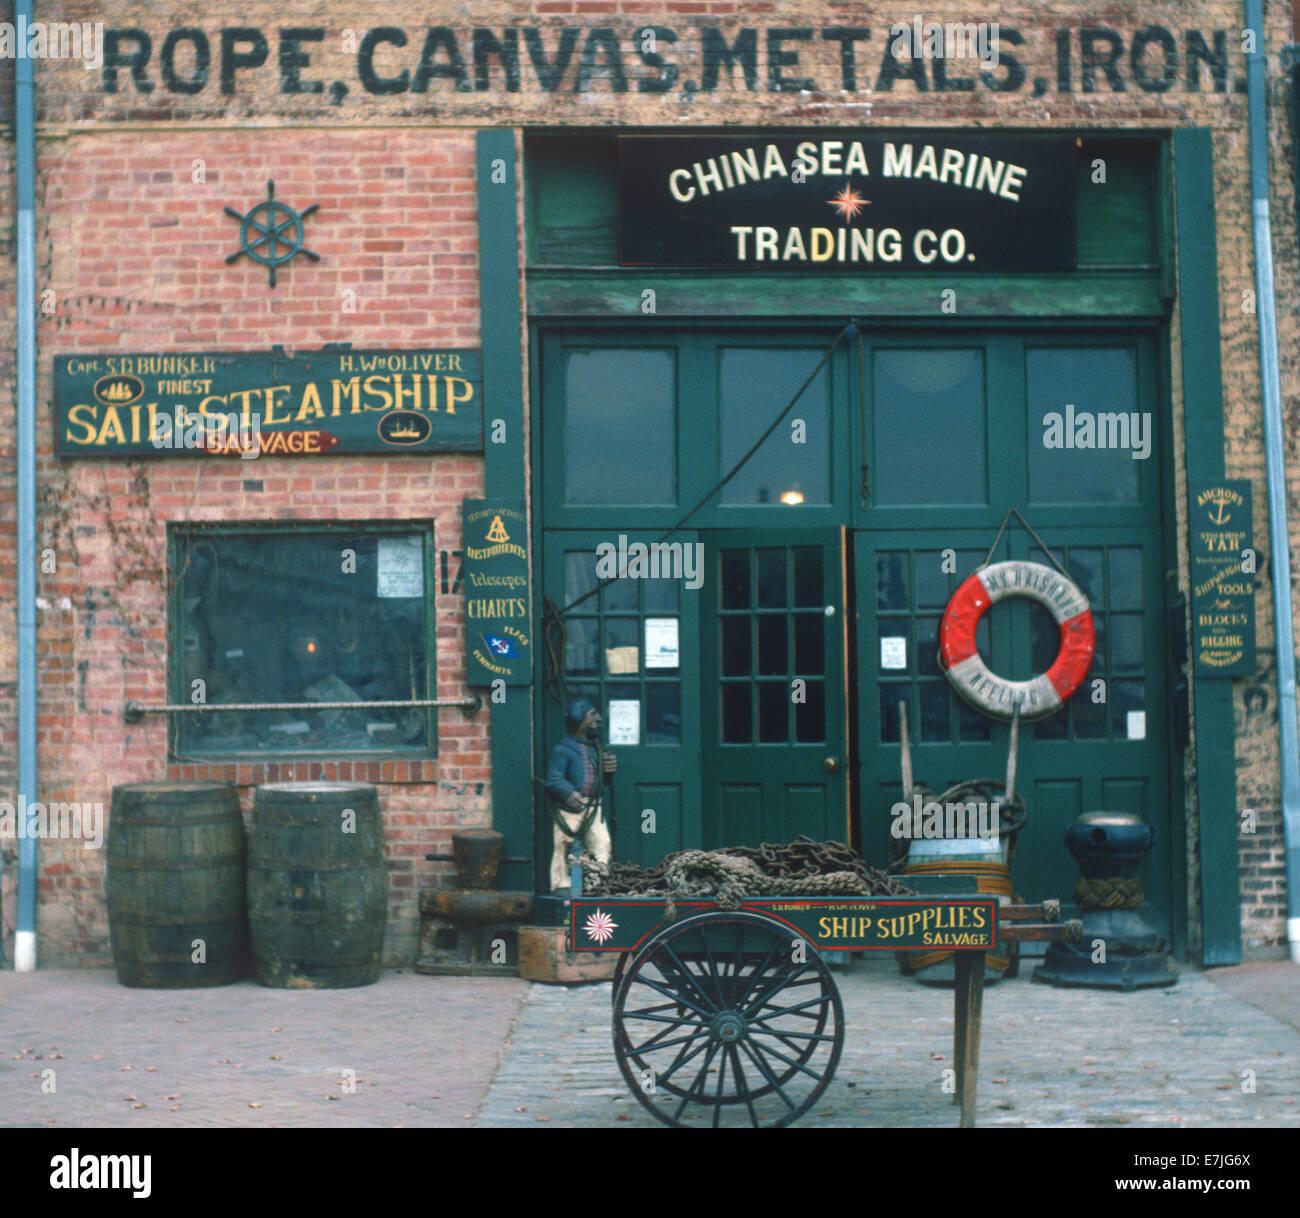 China Sea Marine Trading Company, Fells Point, Baltimore, Maryland - Stock Image